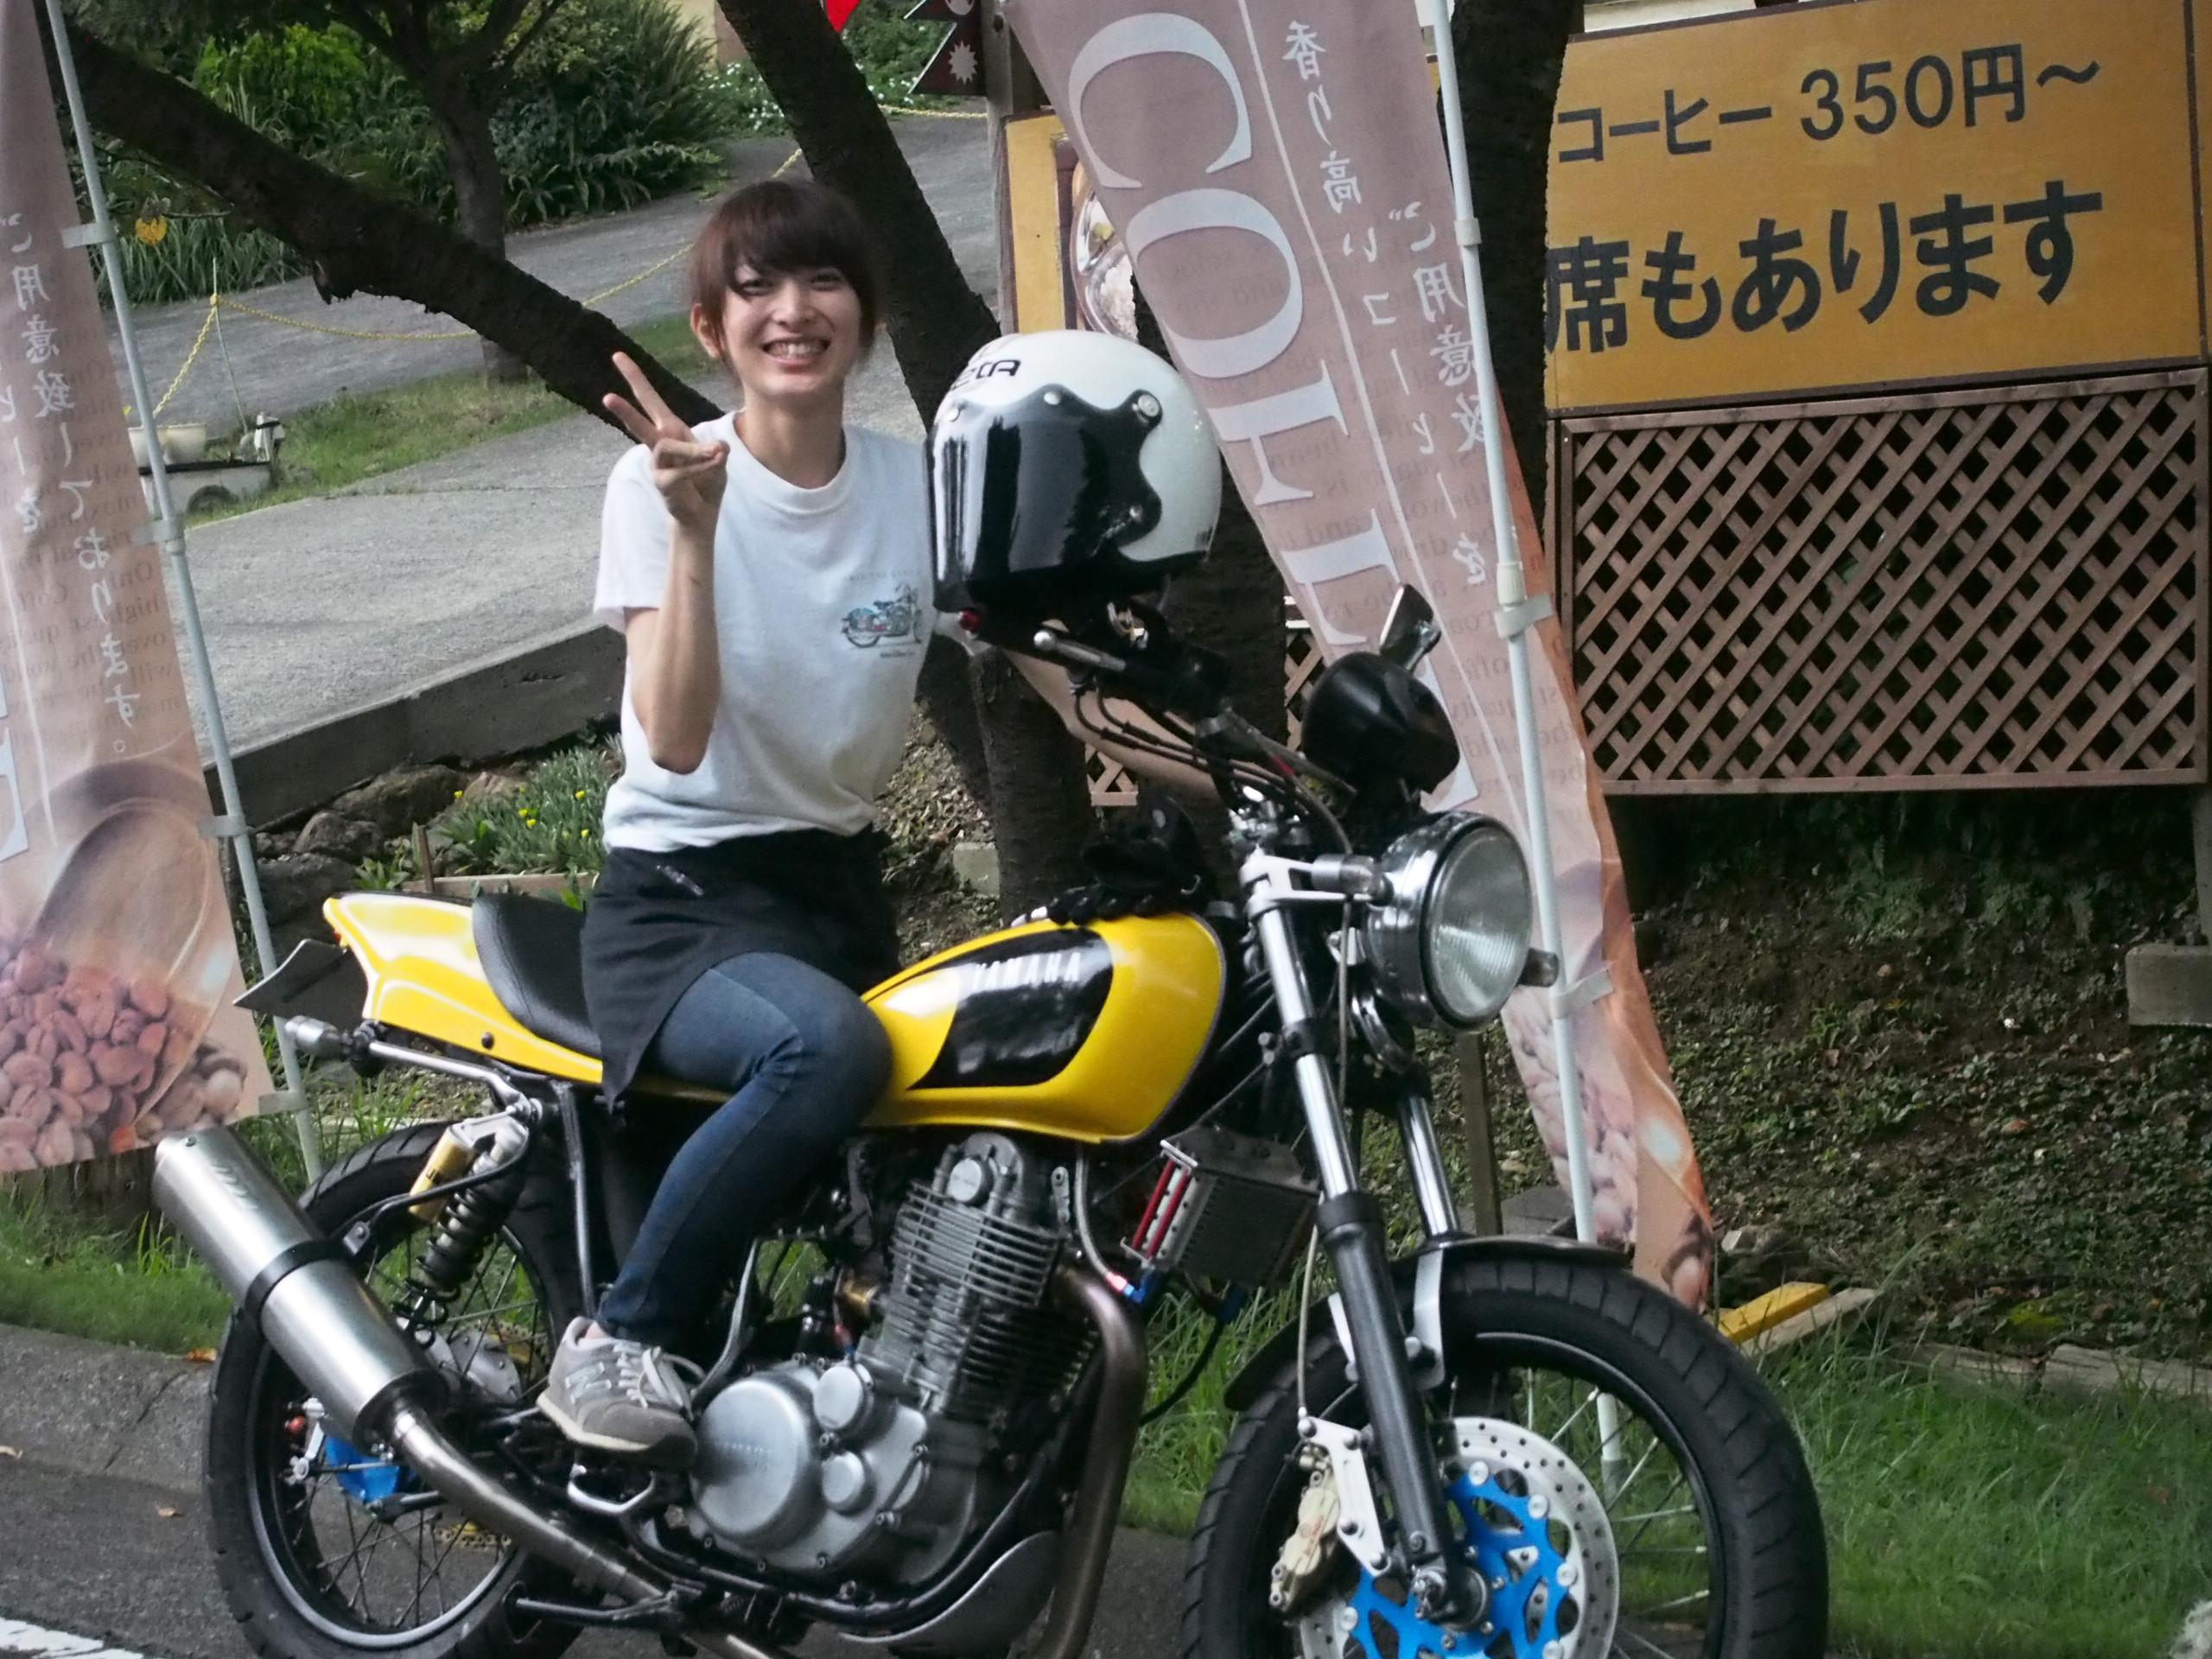 https://cdn.camp-fire.jp/jbimages/f8301555-c68e-480d-b270-987008d167b3.JPG